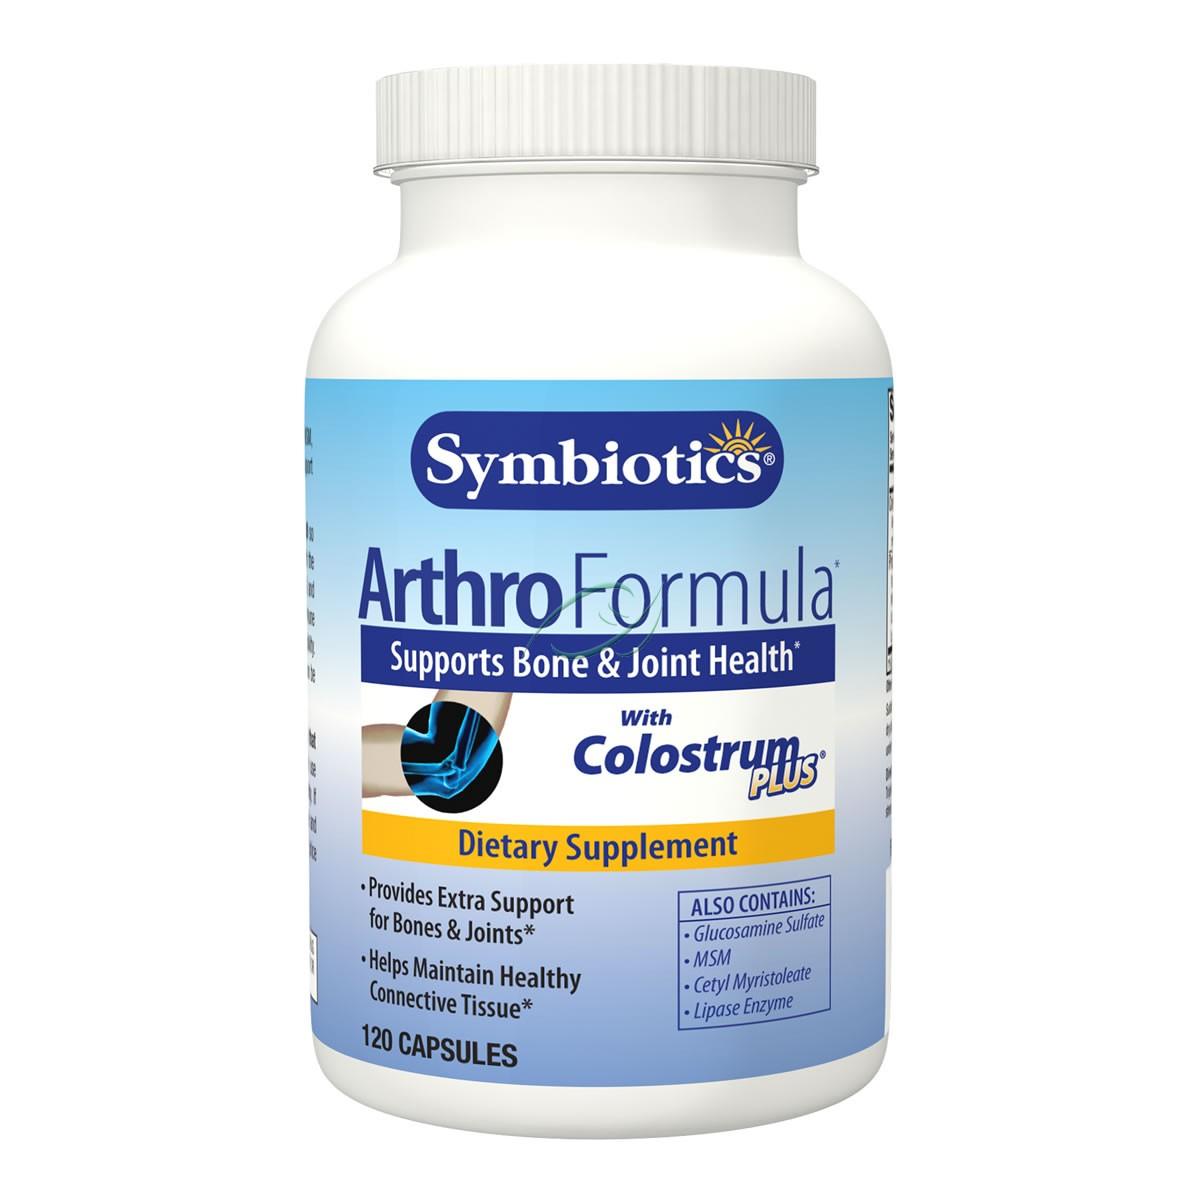 SYMBIOTICS Artho Formula with Colostrum Plus, 120 Caps, 480 mg, From Symbiotics at Sears.com